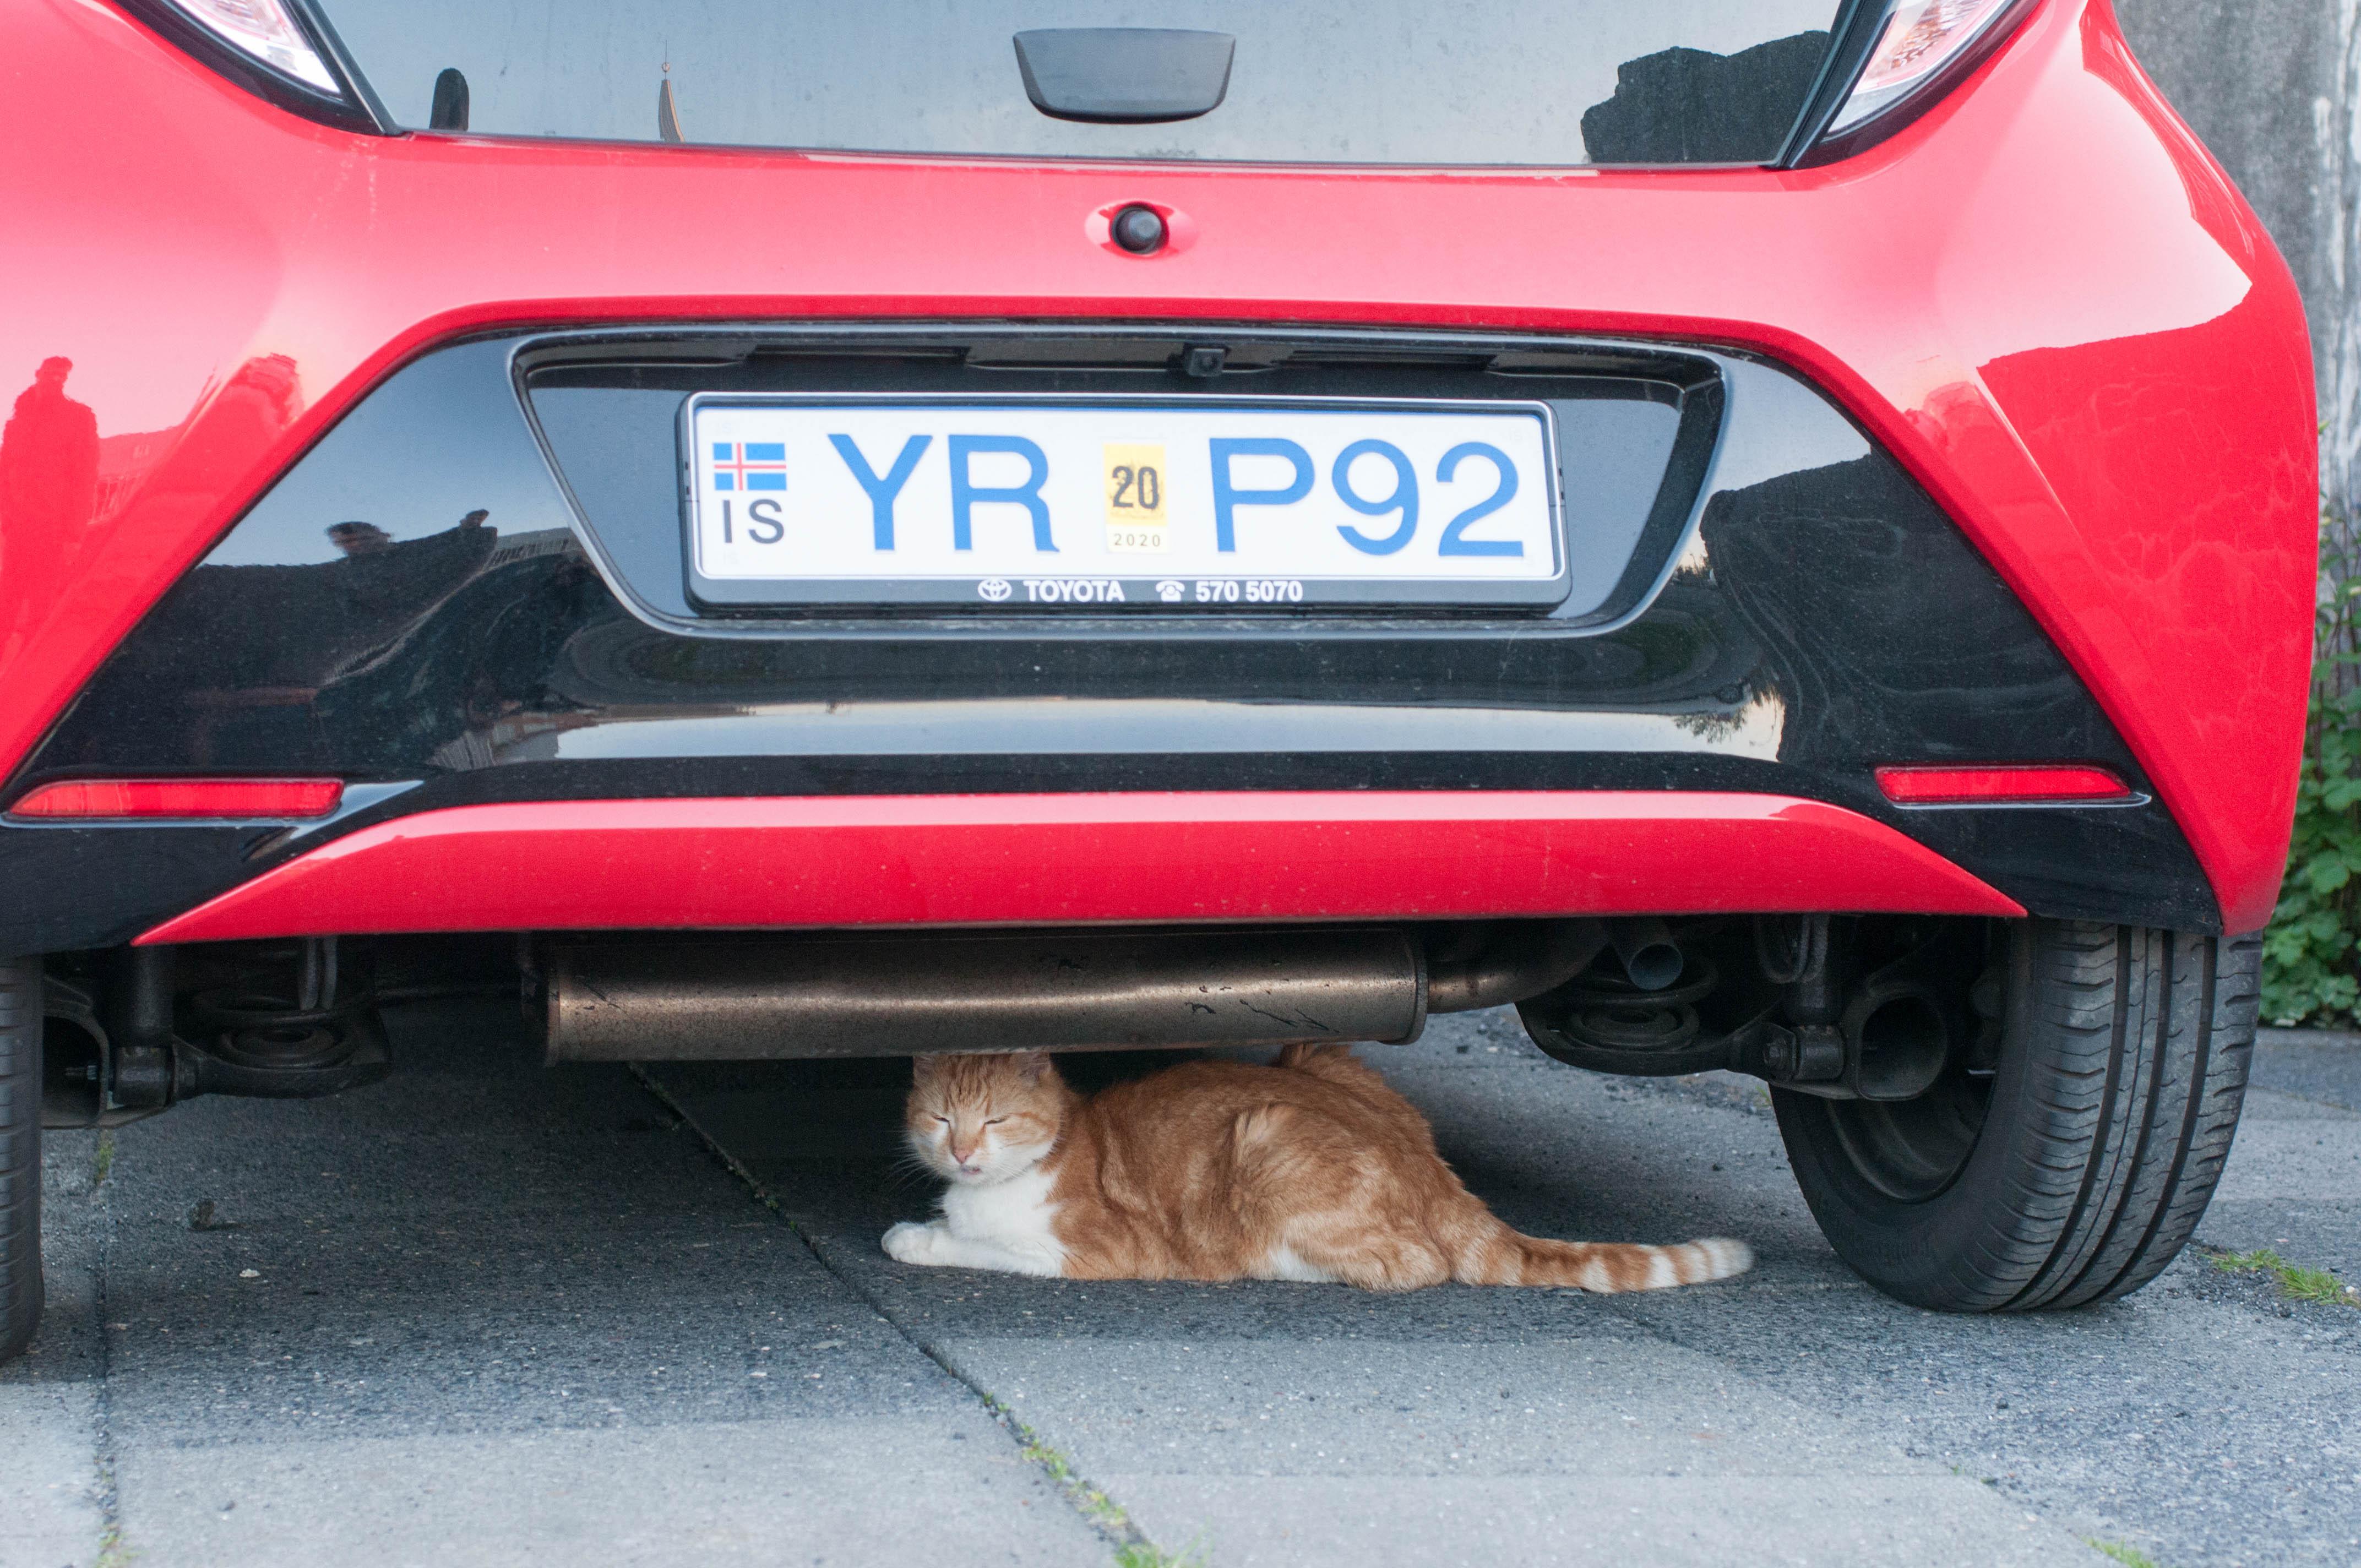 Katze unter Auto